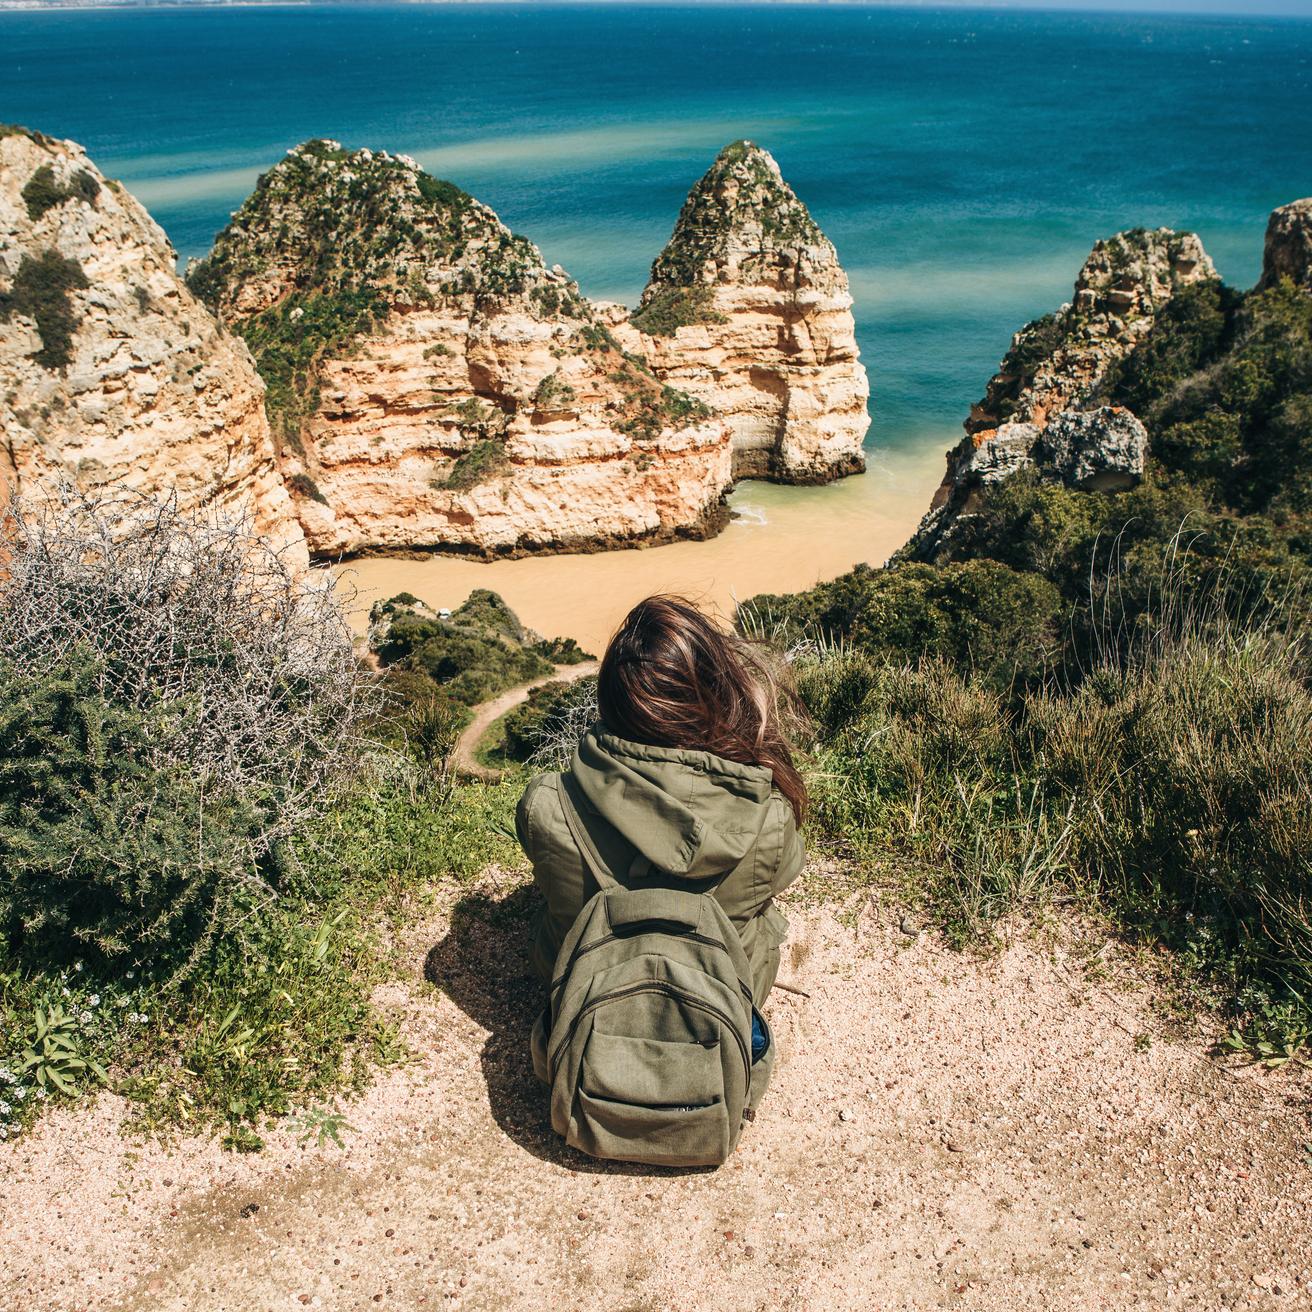 https://www.travelersjoy.com/blog/Fall_honeymoon_Destinations_Algarve.jpg